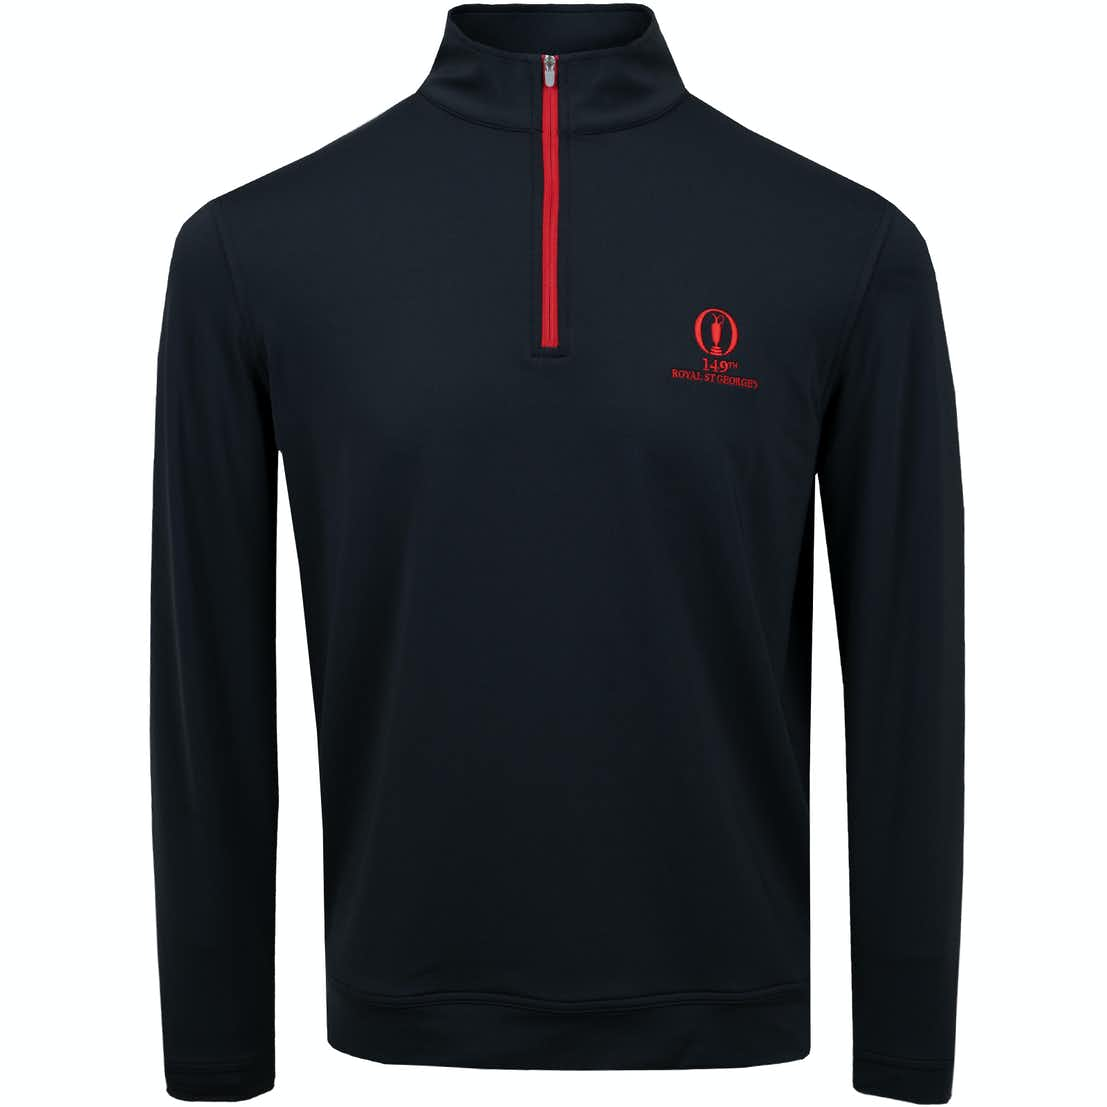 149th Royal St George's Full-Zip Sweater - Black